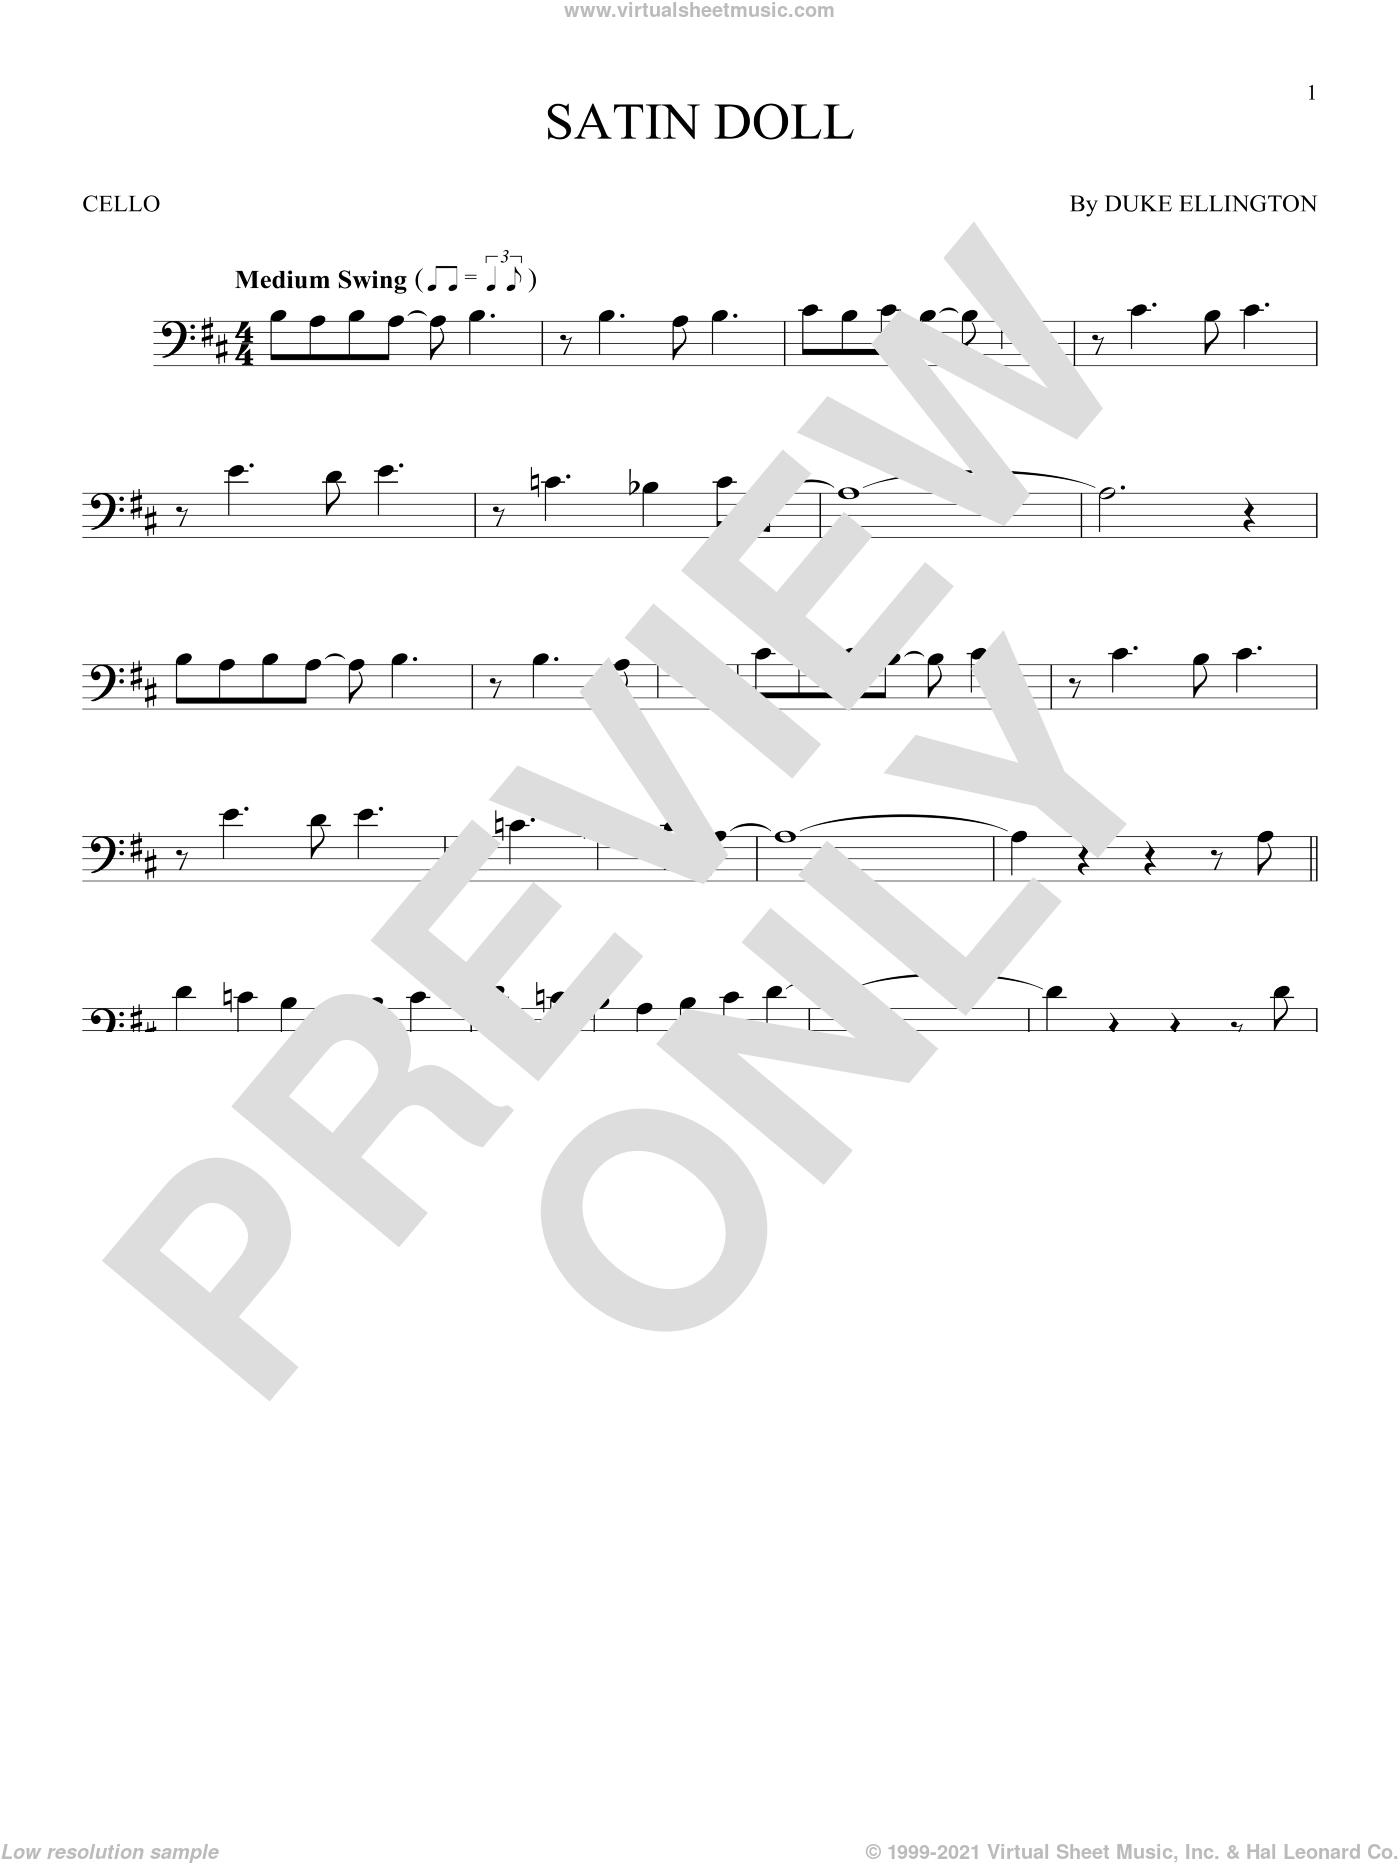 Satin Doll sheet music for cello solo by Duke Ellington, Billy Strayhorn and Johnny Mercer, intermediate skill level